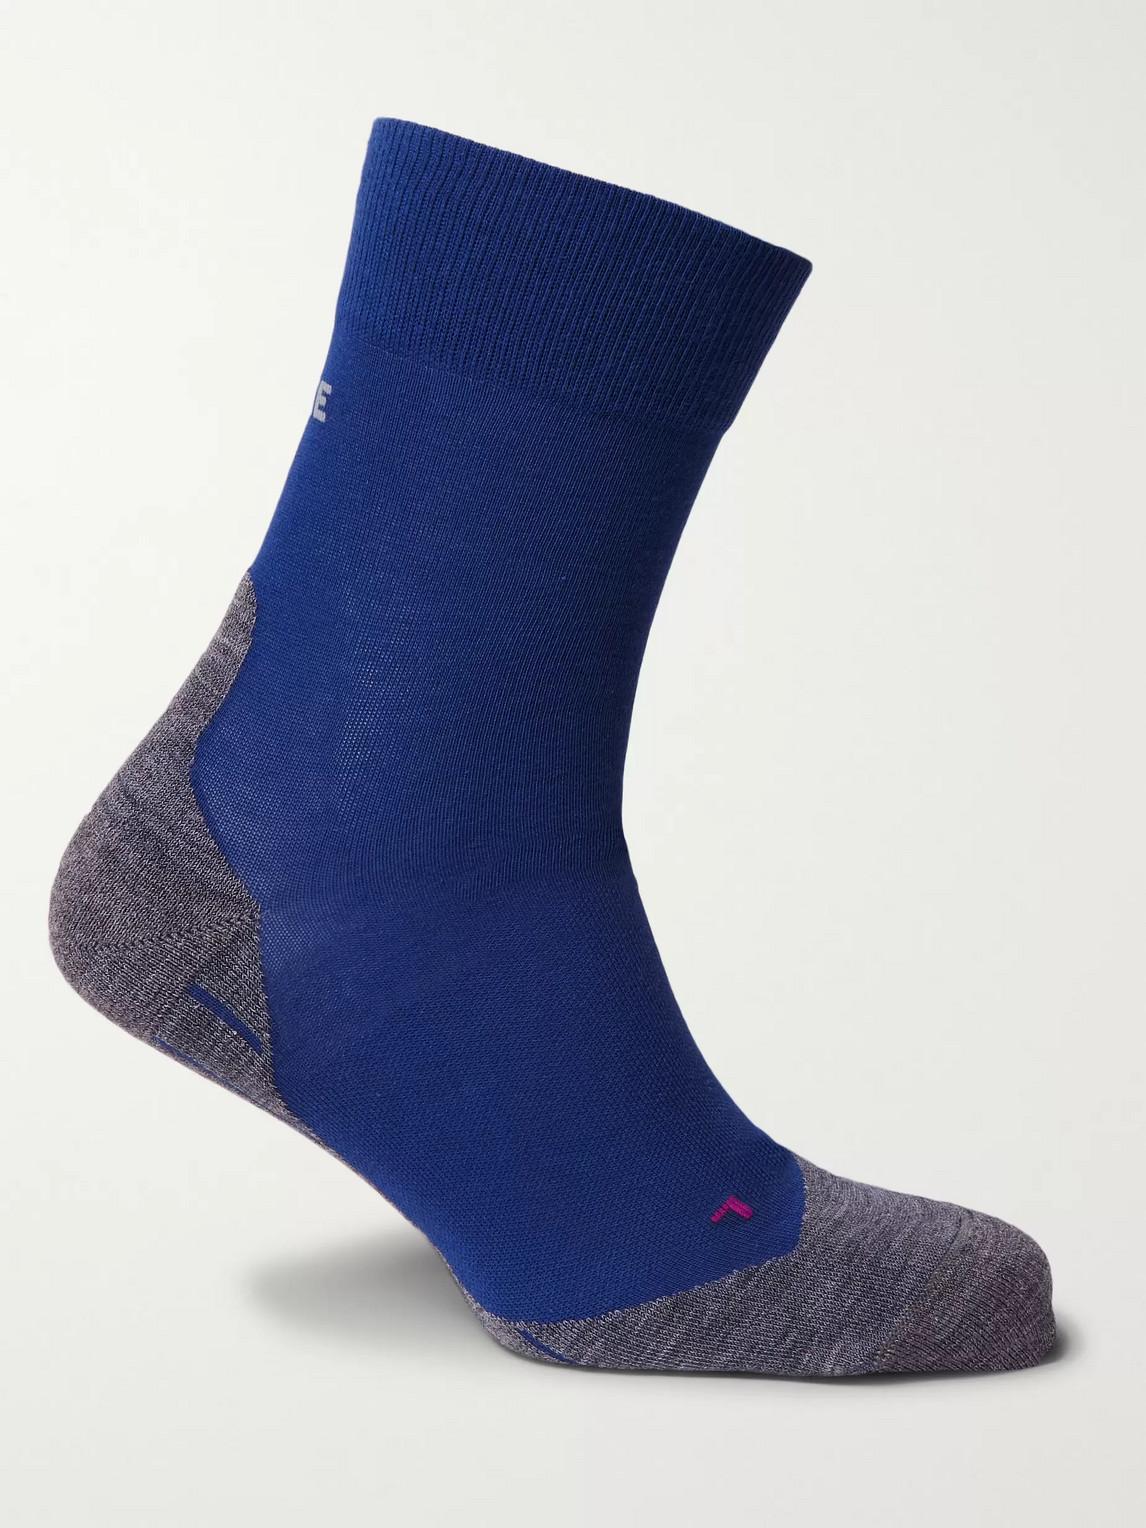 falke ergonomic sport system - ru4 stretch-knit socks - men - blue